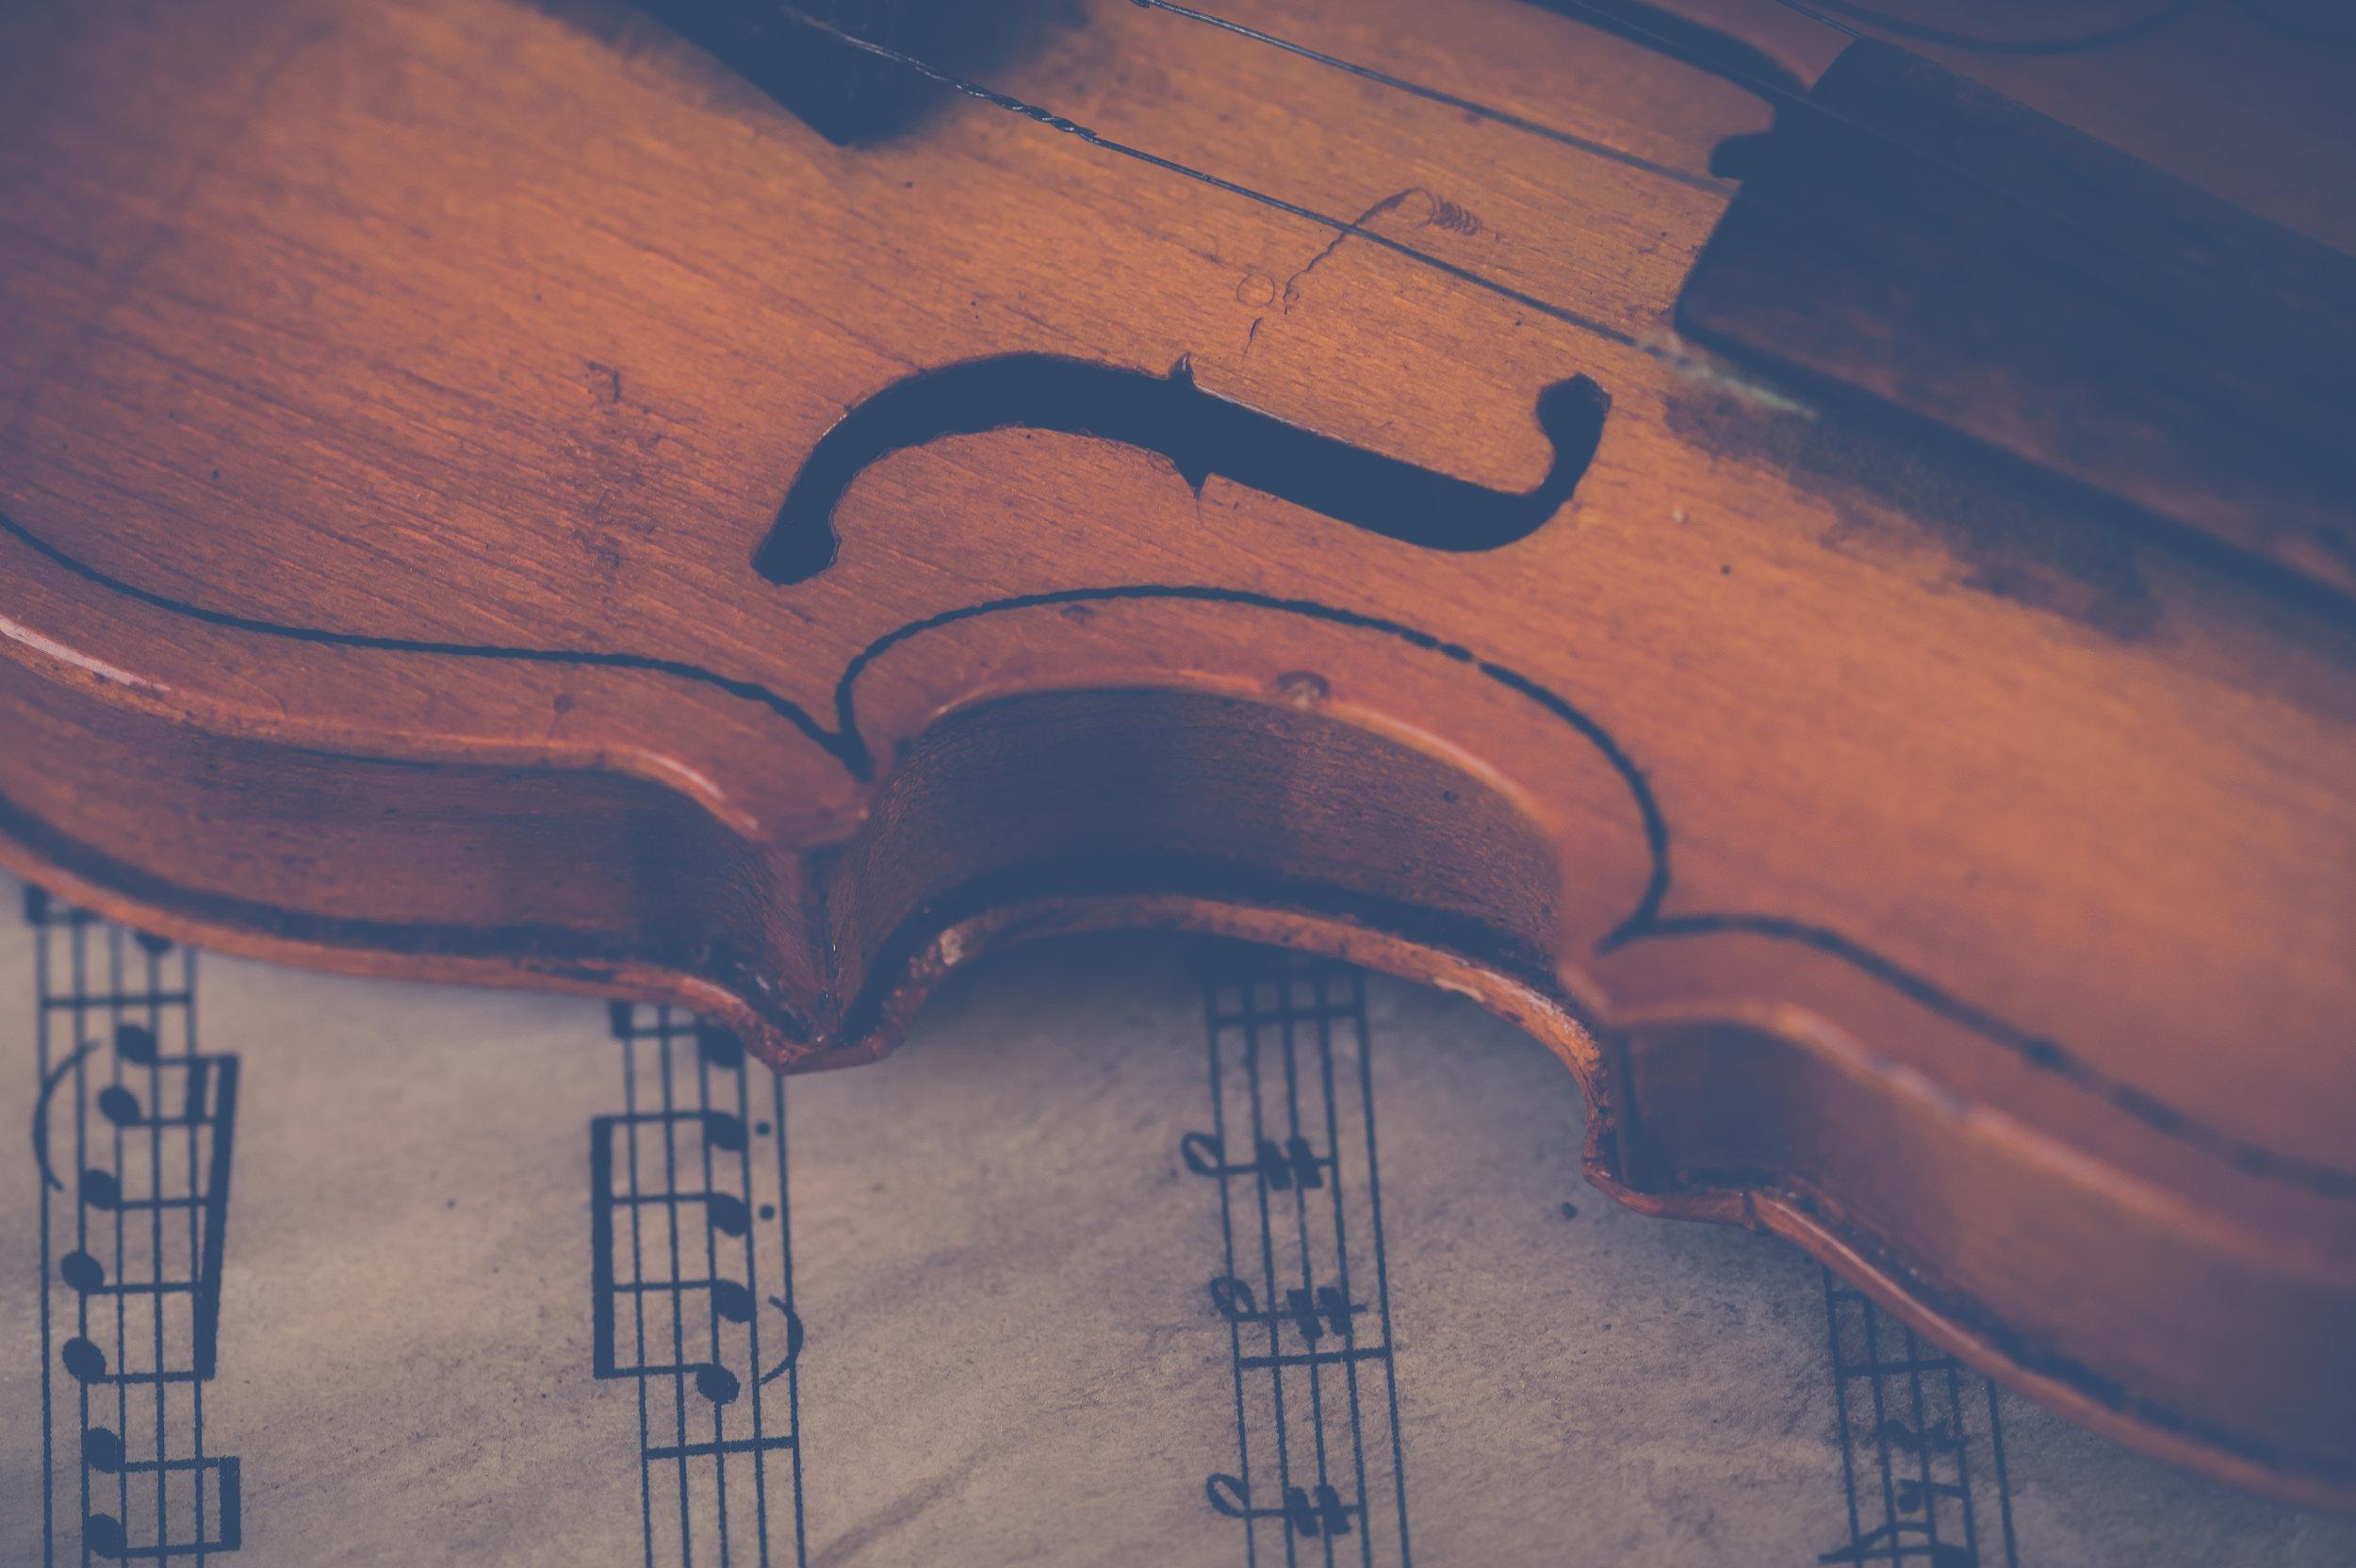 violin-sheet-music-pexels-photo-697672.jpeg